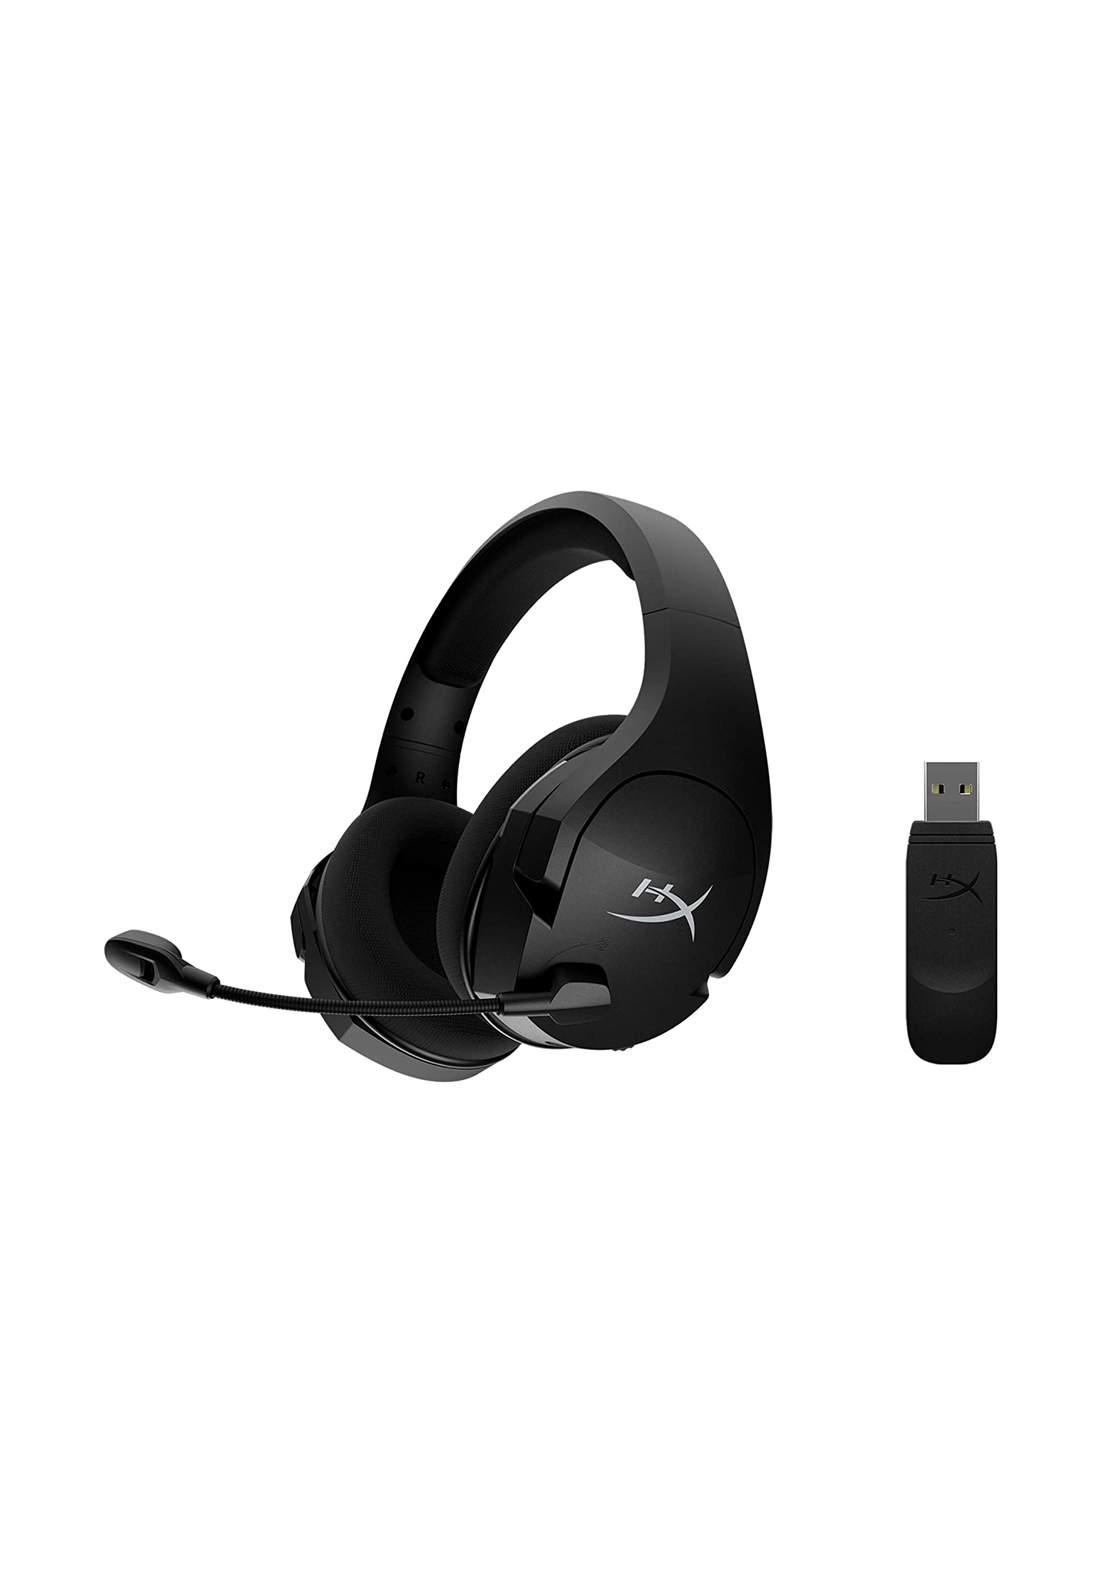 HyperX  Cloud Stinger Core Wireless 7.1 Surround Sound Gaming Headset - Black سماعة